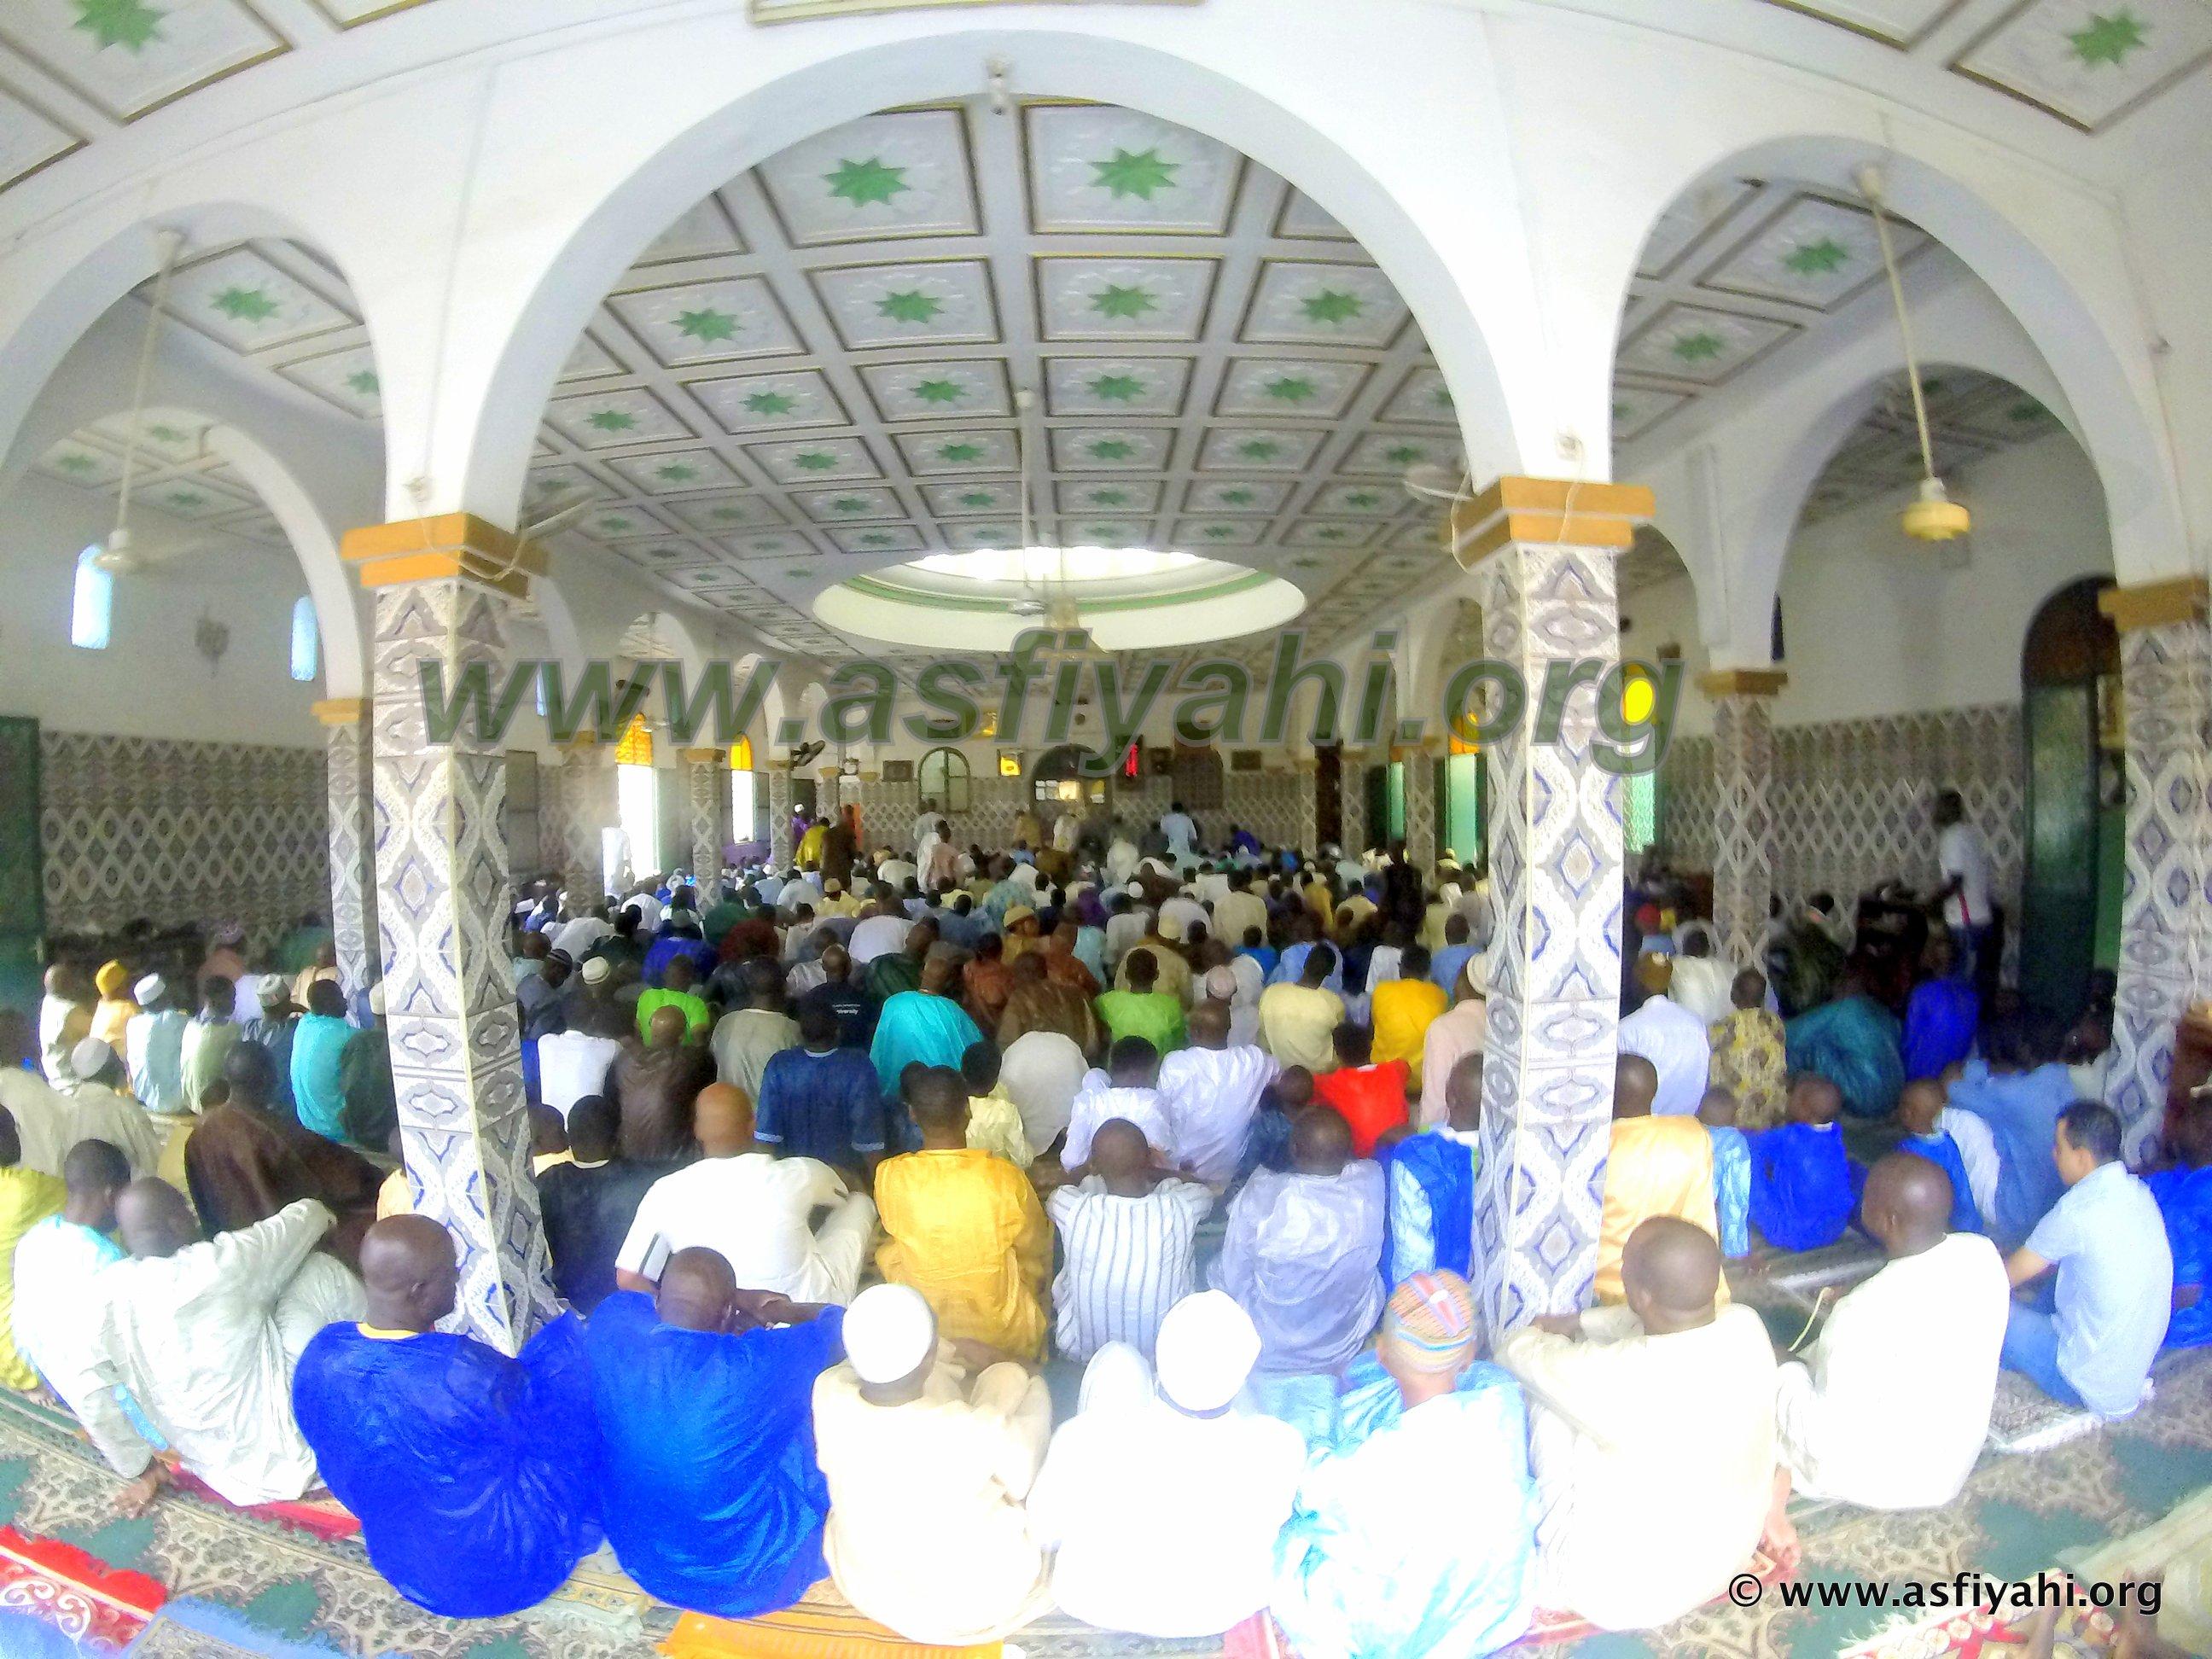 PHOTOS - TABASKI 2015 - Regardez les Images de la Prière à la Zawiya El Hadj Malick SY de Dakar